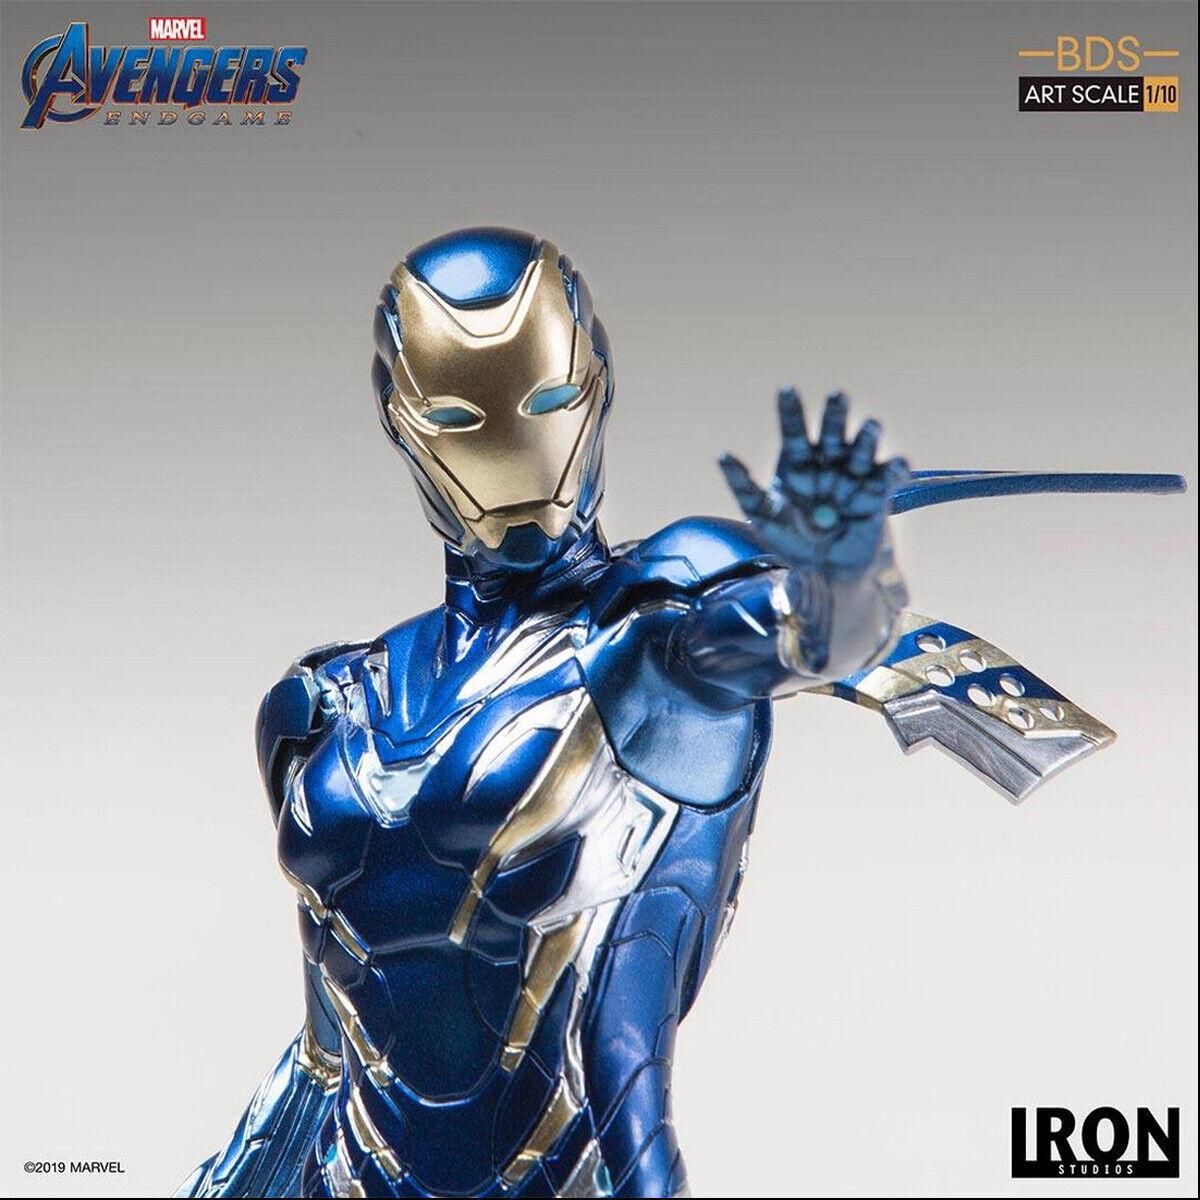 Iron Studios MARCAS19119-10 1 10 Scale Avengers  Endgame Pepper Potts Statue